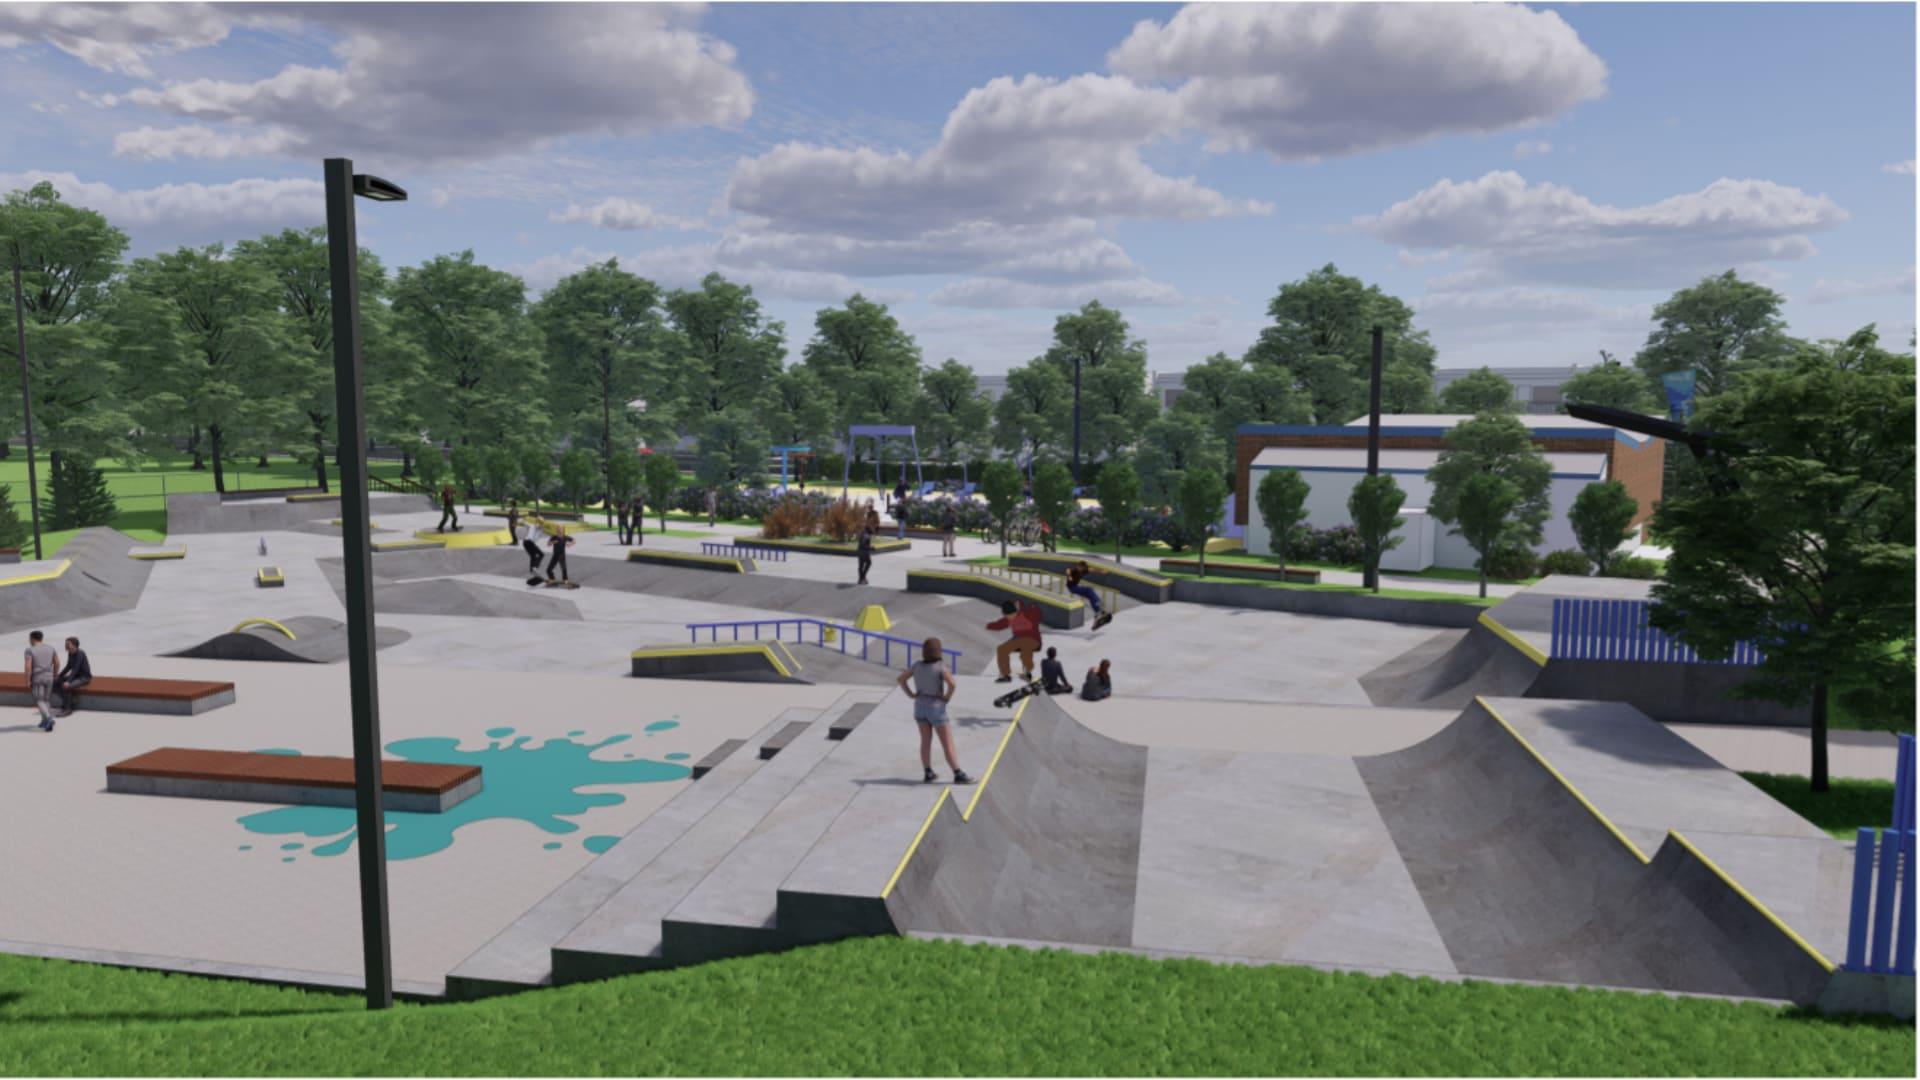 LSL_parc Raymond_skatepark